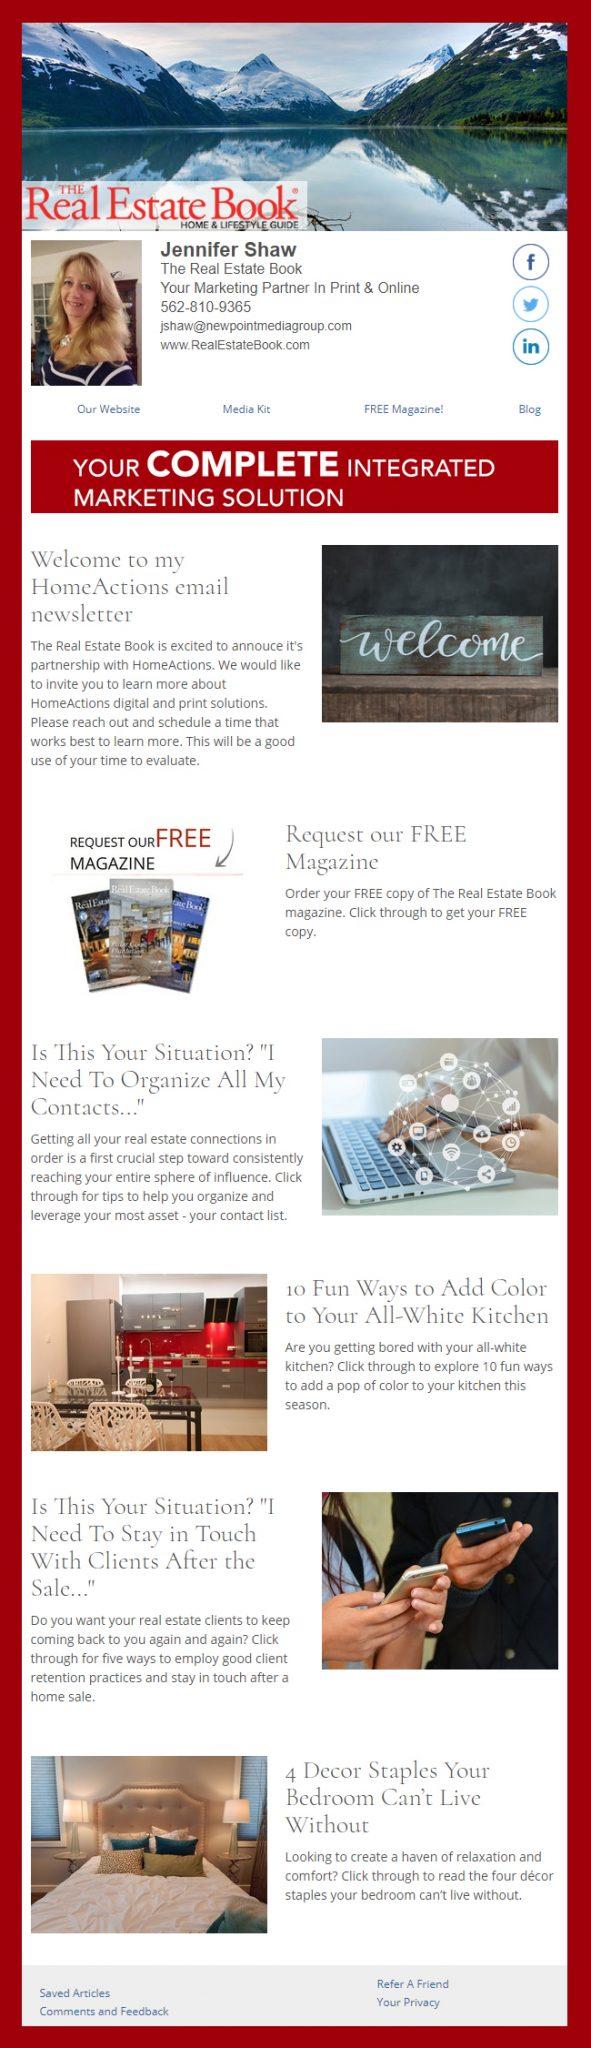 Sample Real Estate Marketing Email Newsletter